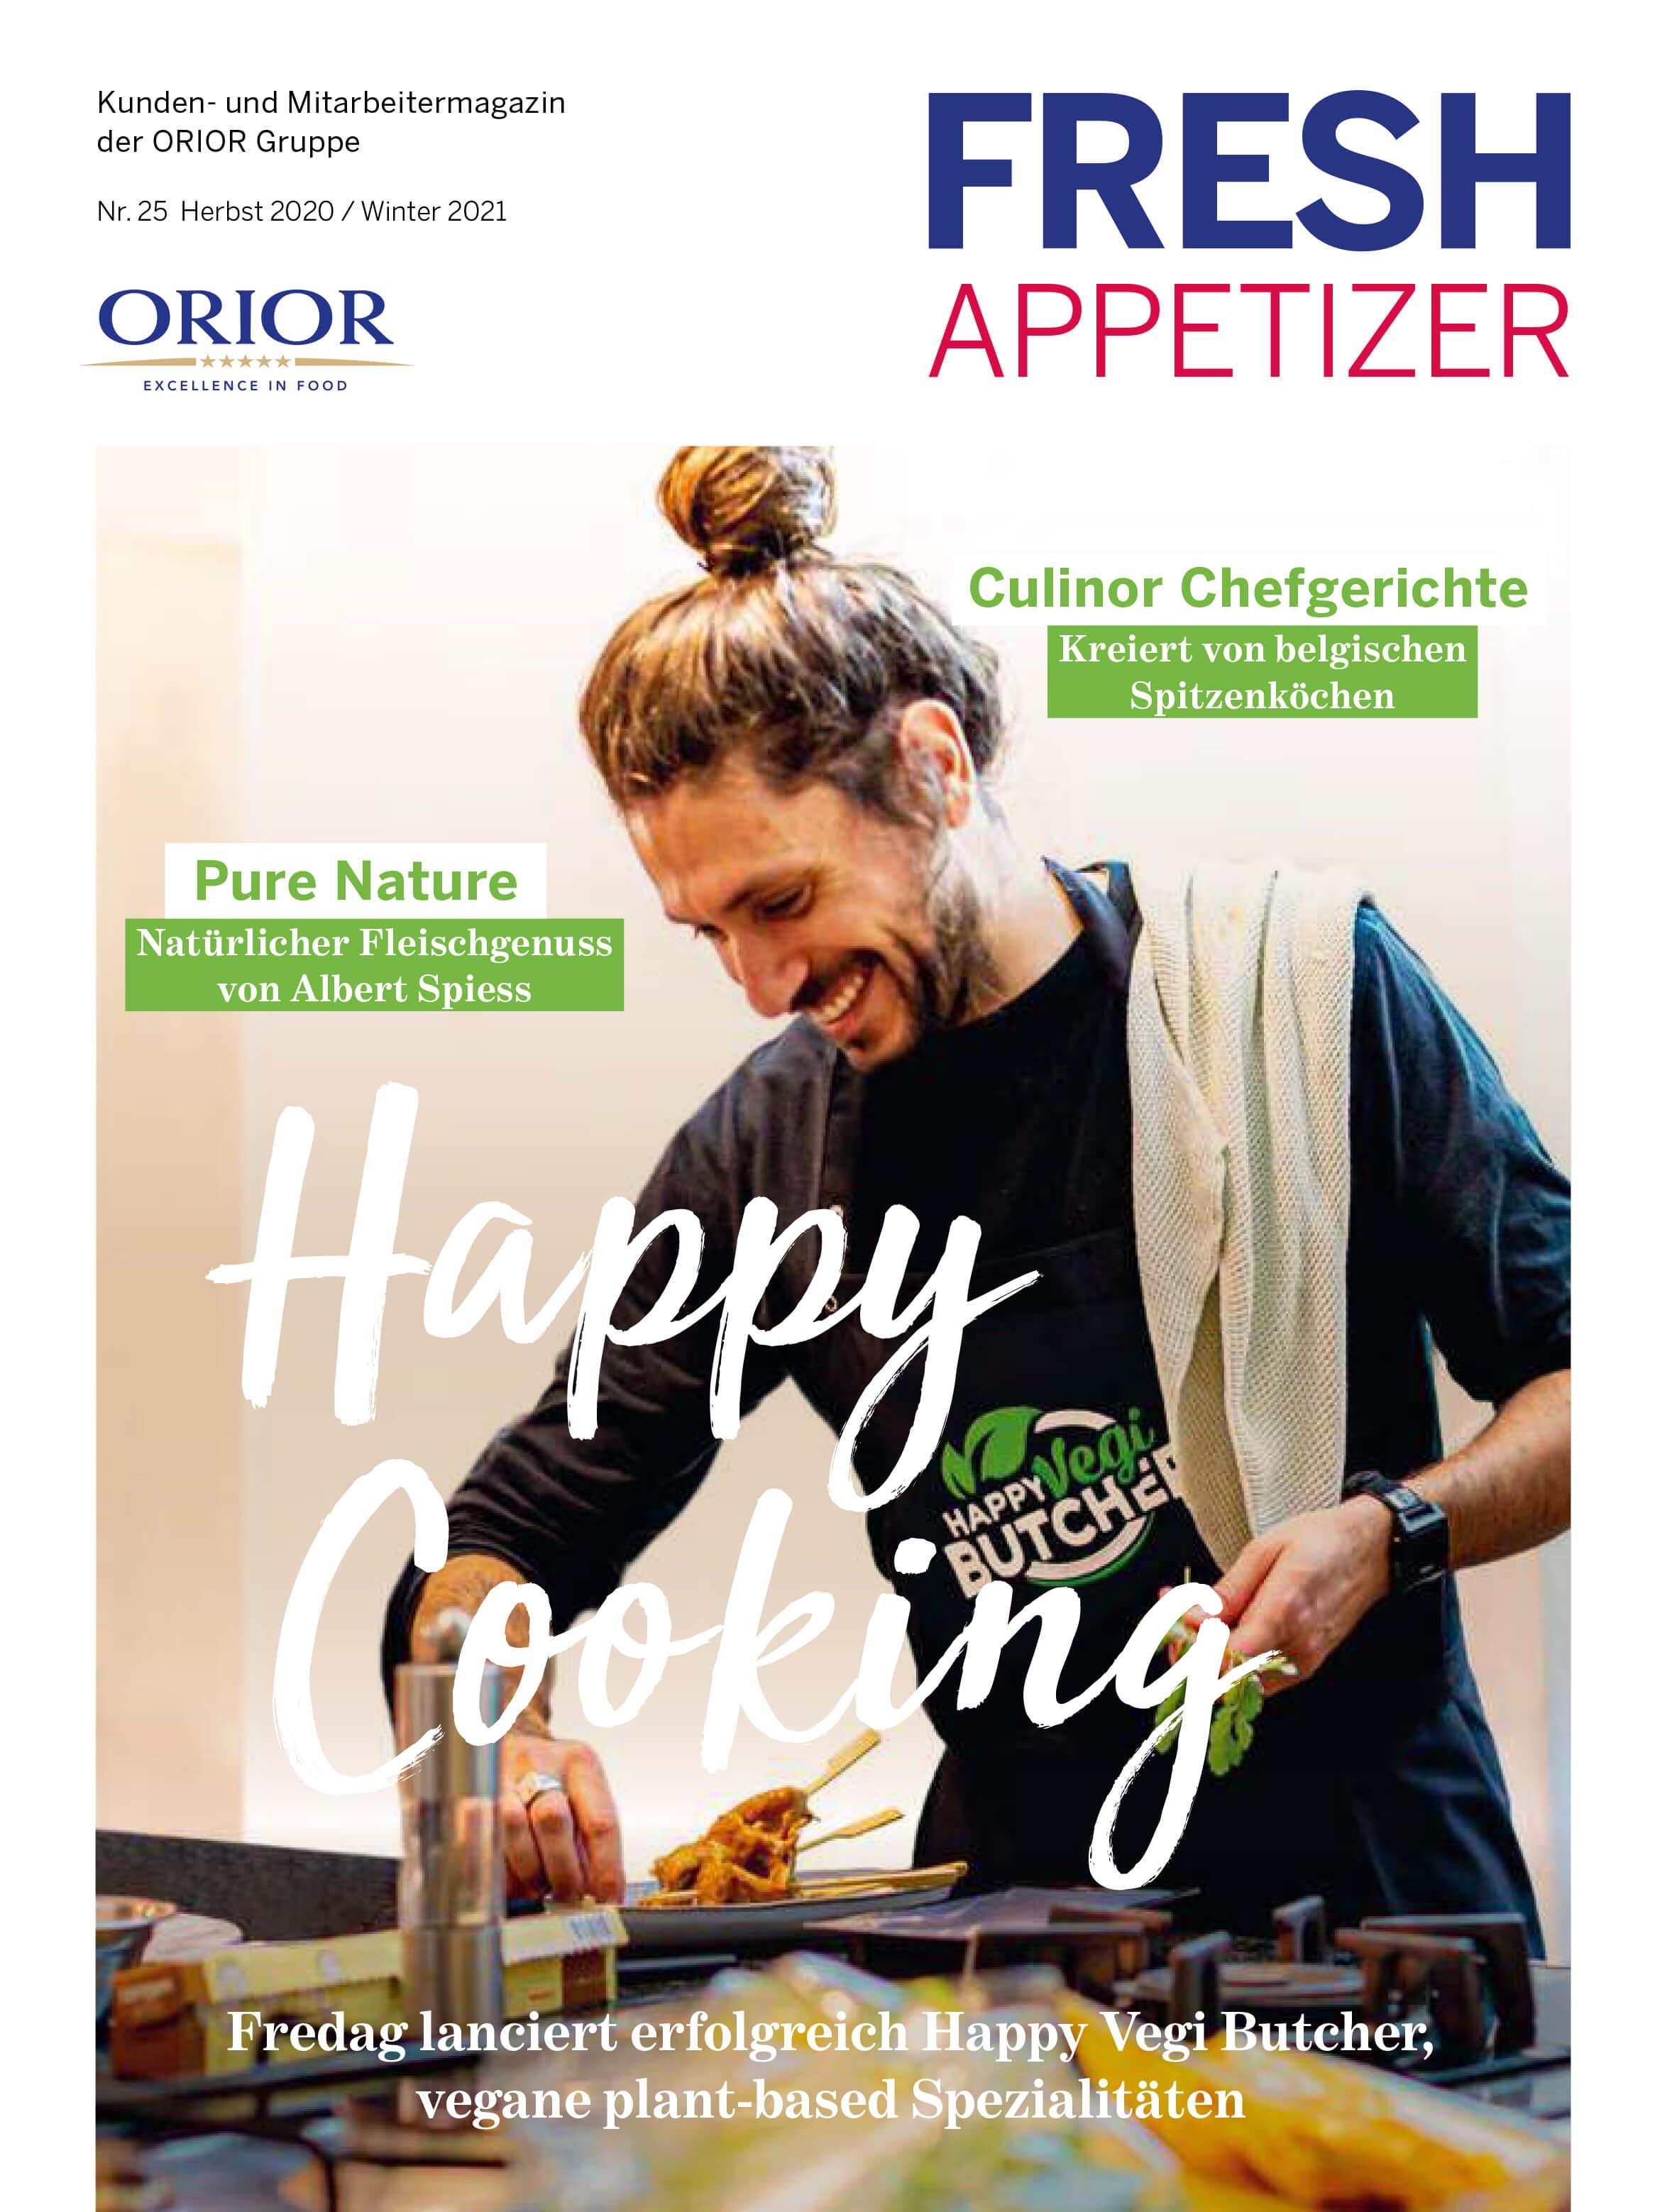 Food-Inspiration mit dem Fresh Appetizer